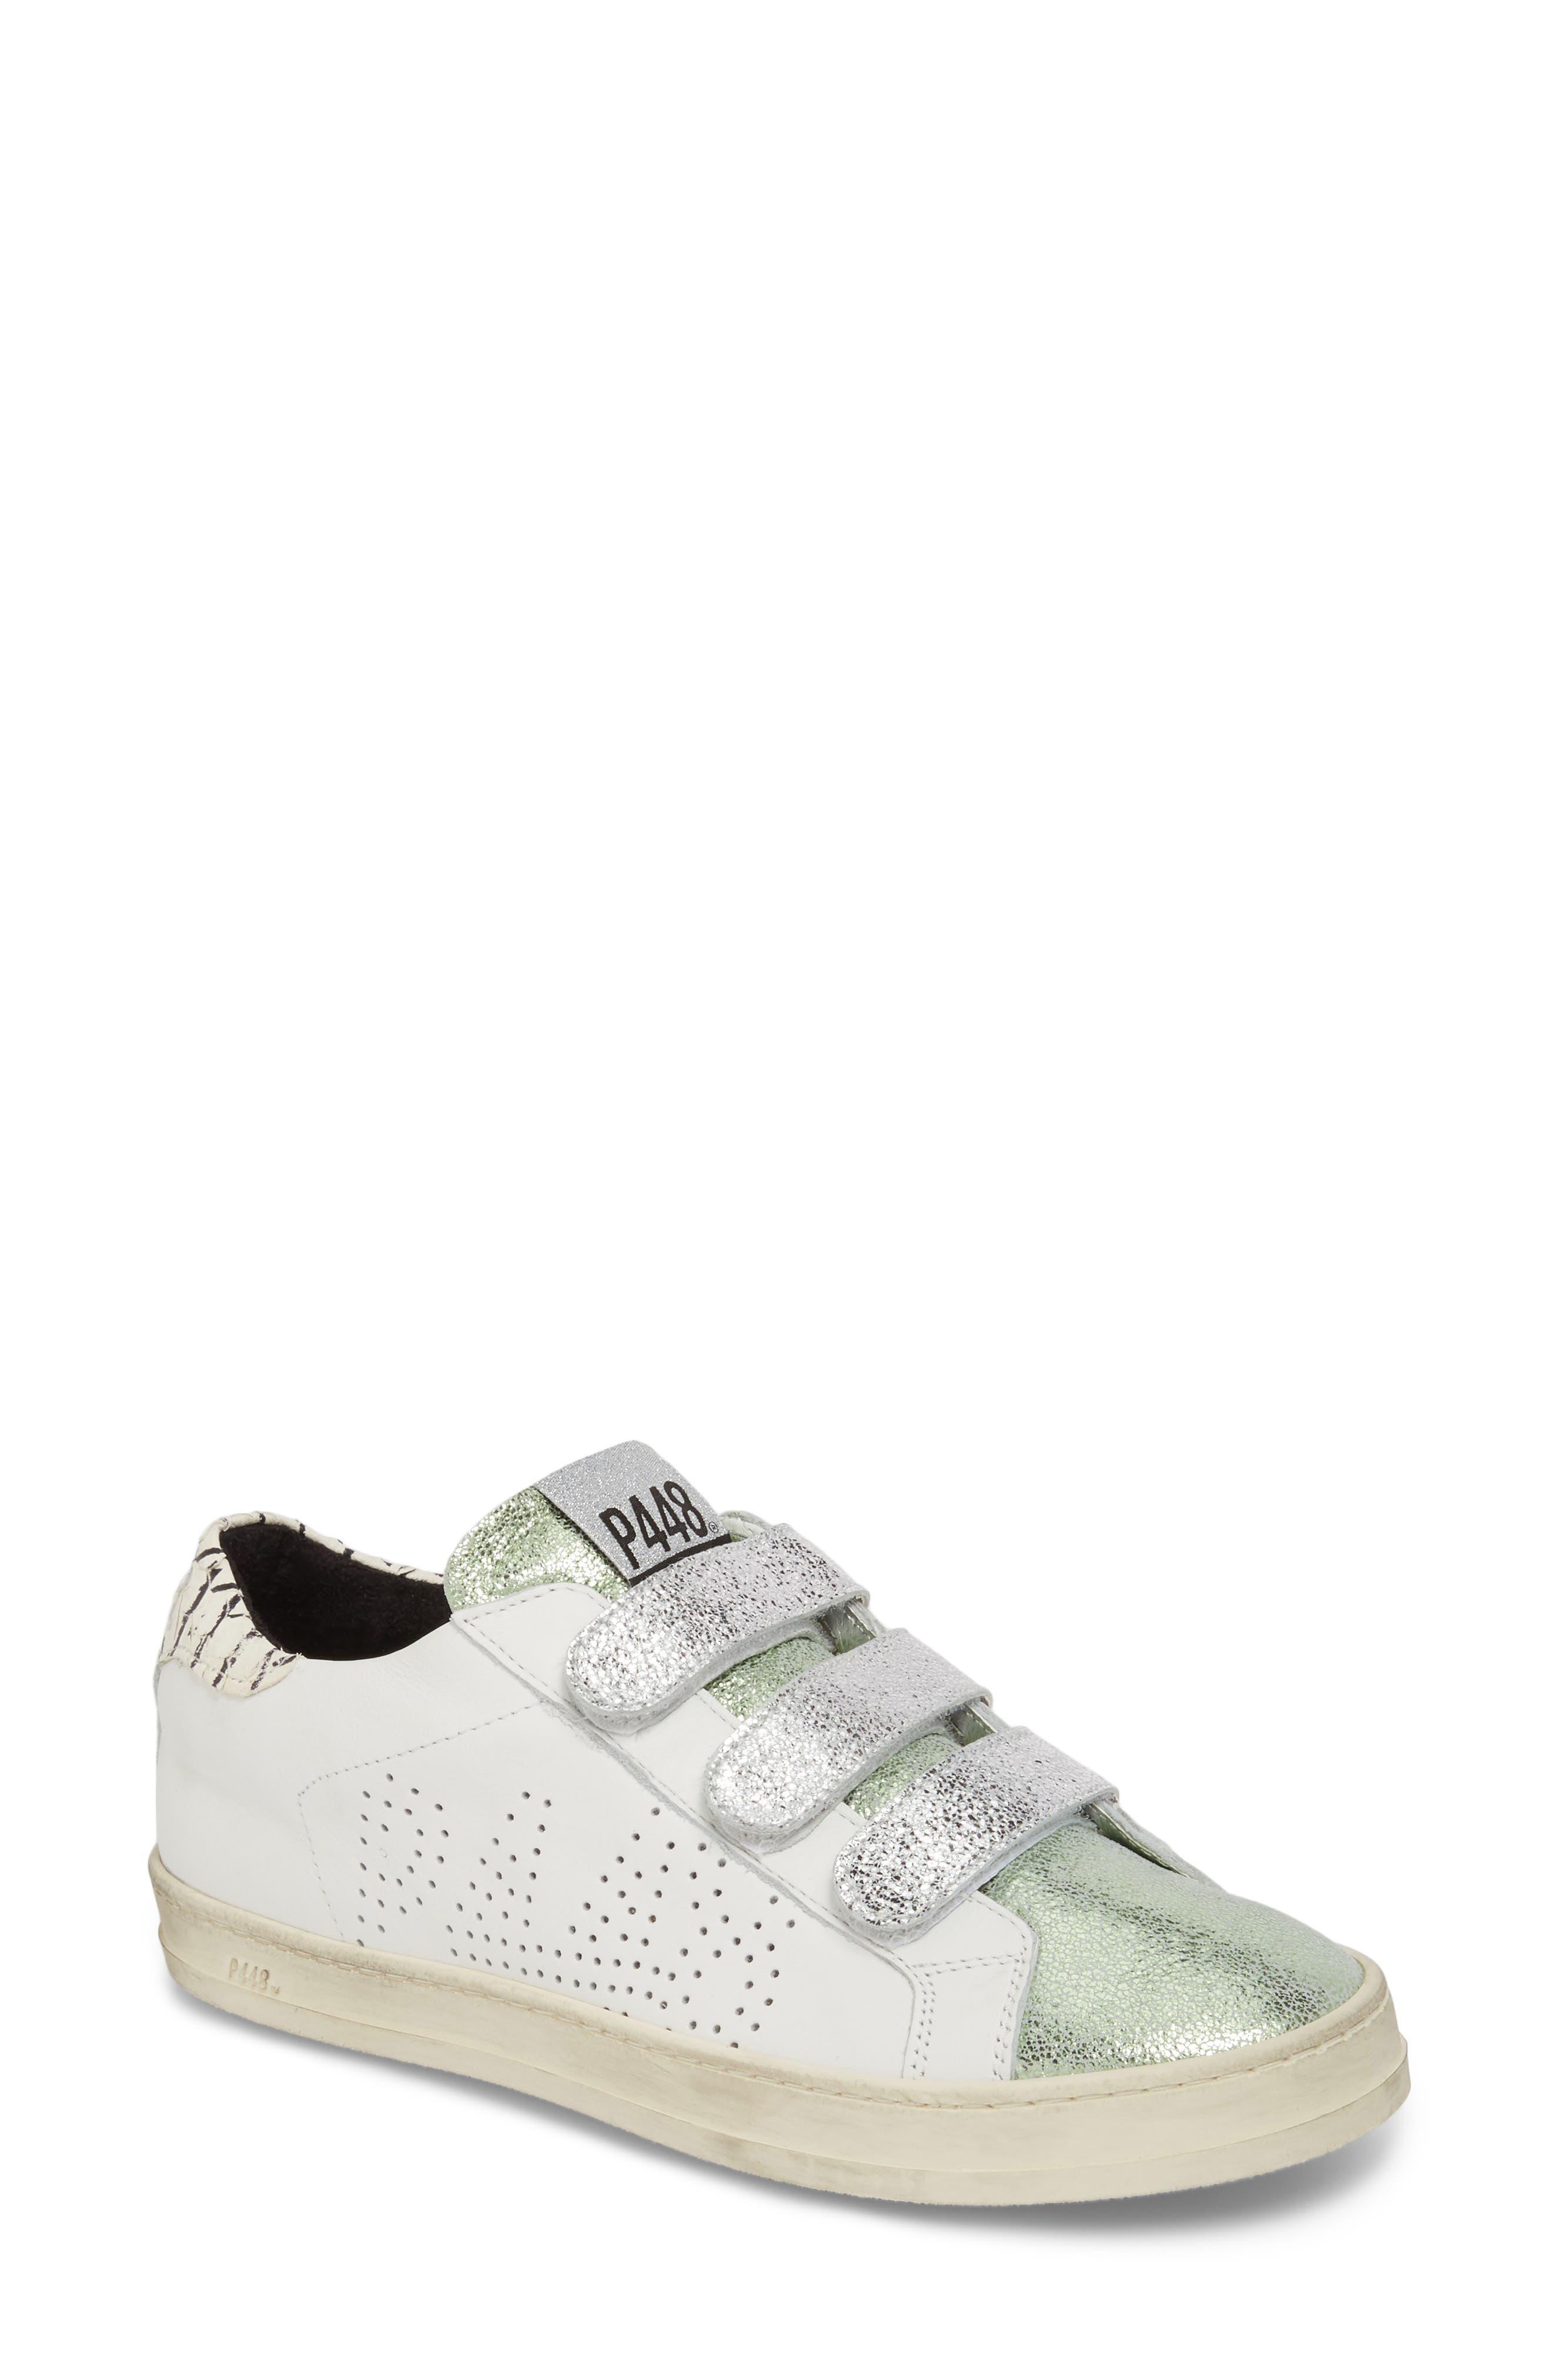 Ralph Sneaker,                         Main,                         color, Green